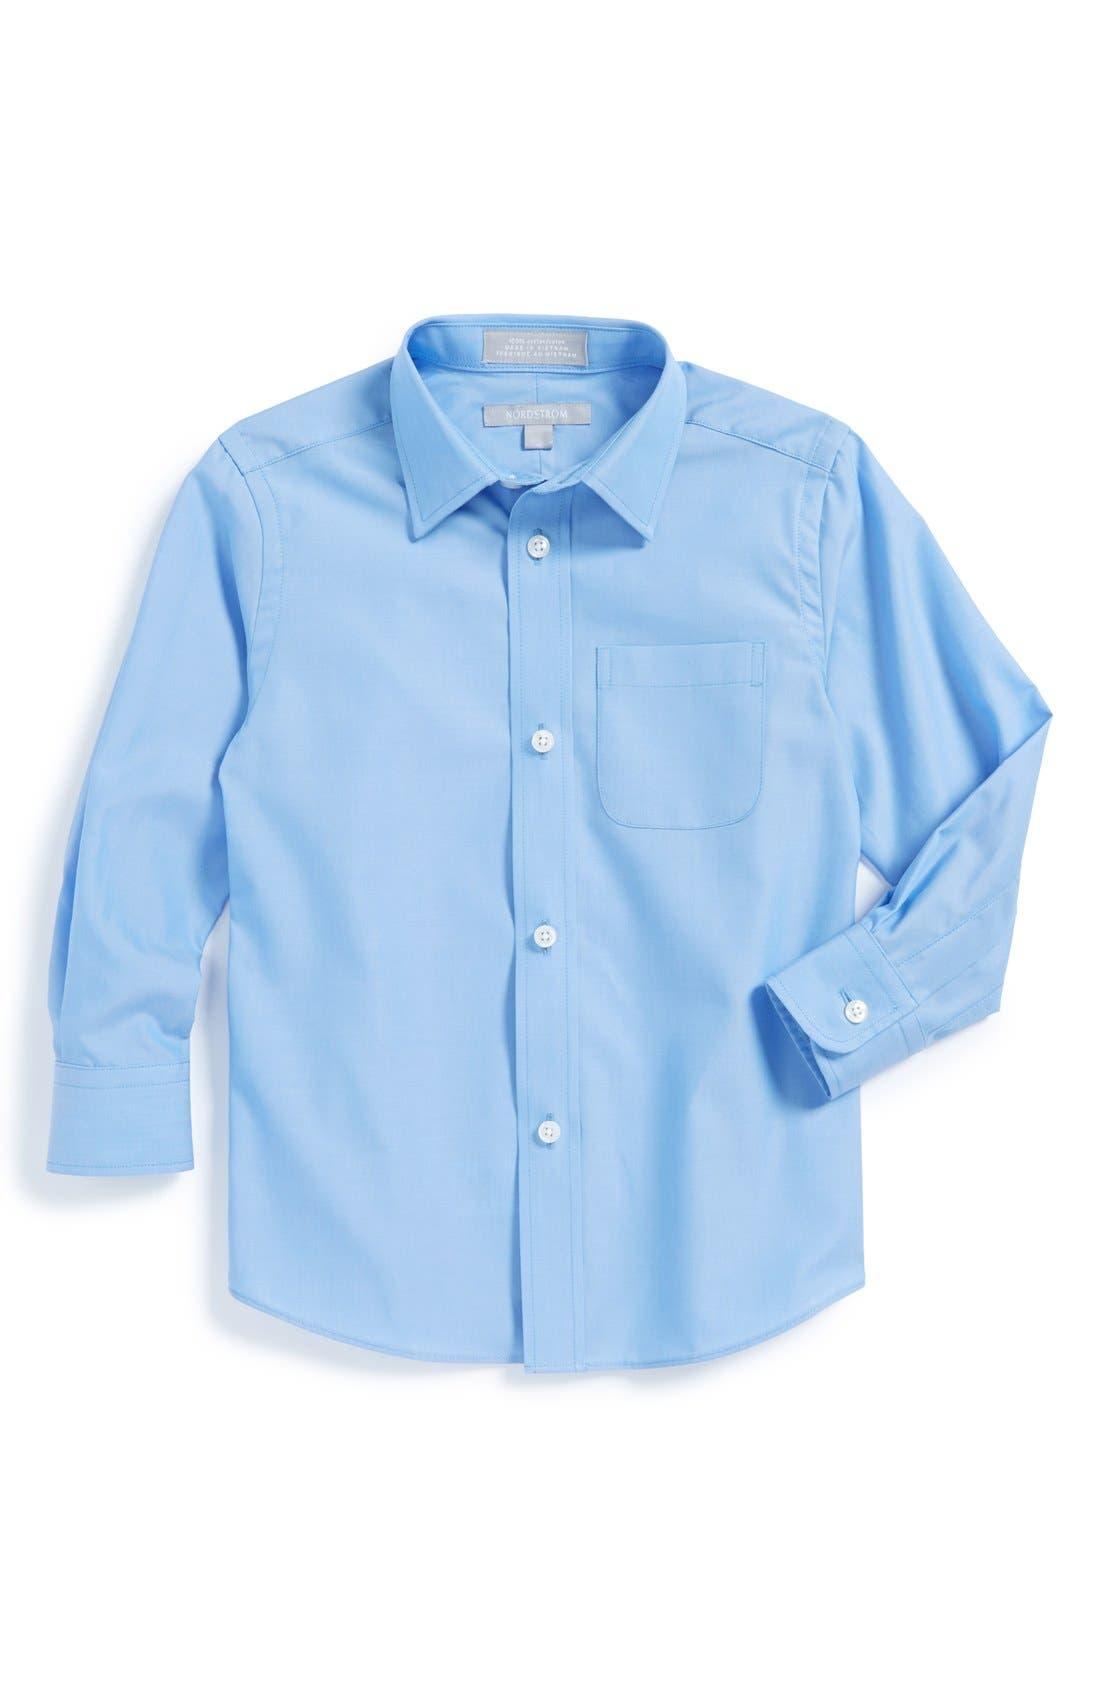 NORDSTROM Cotton Poplin Dress Shirt, Main, color, BLUE SMART